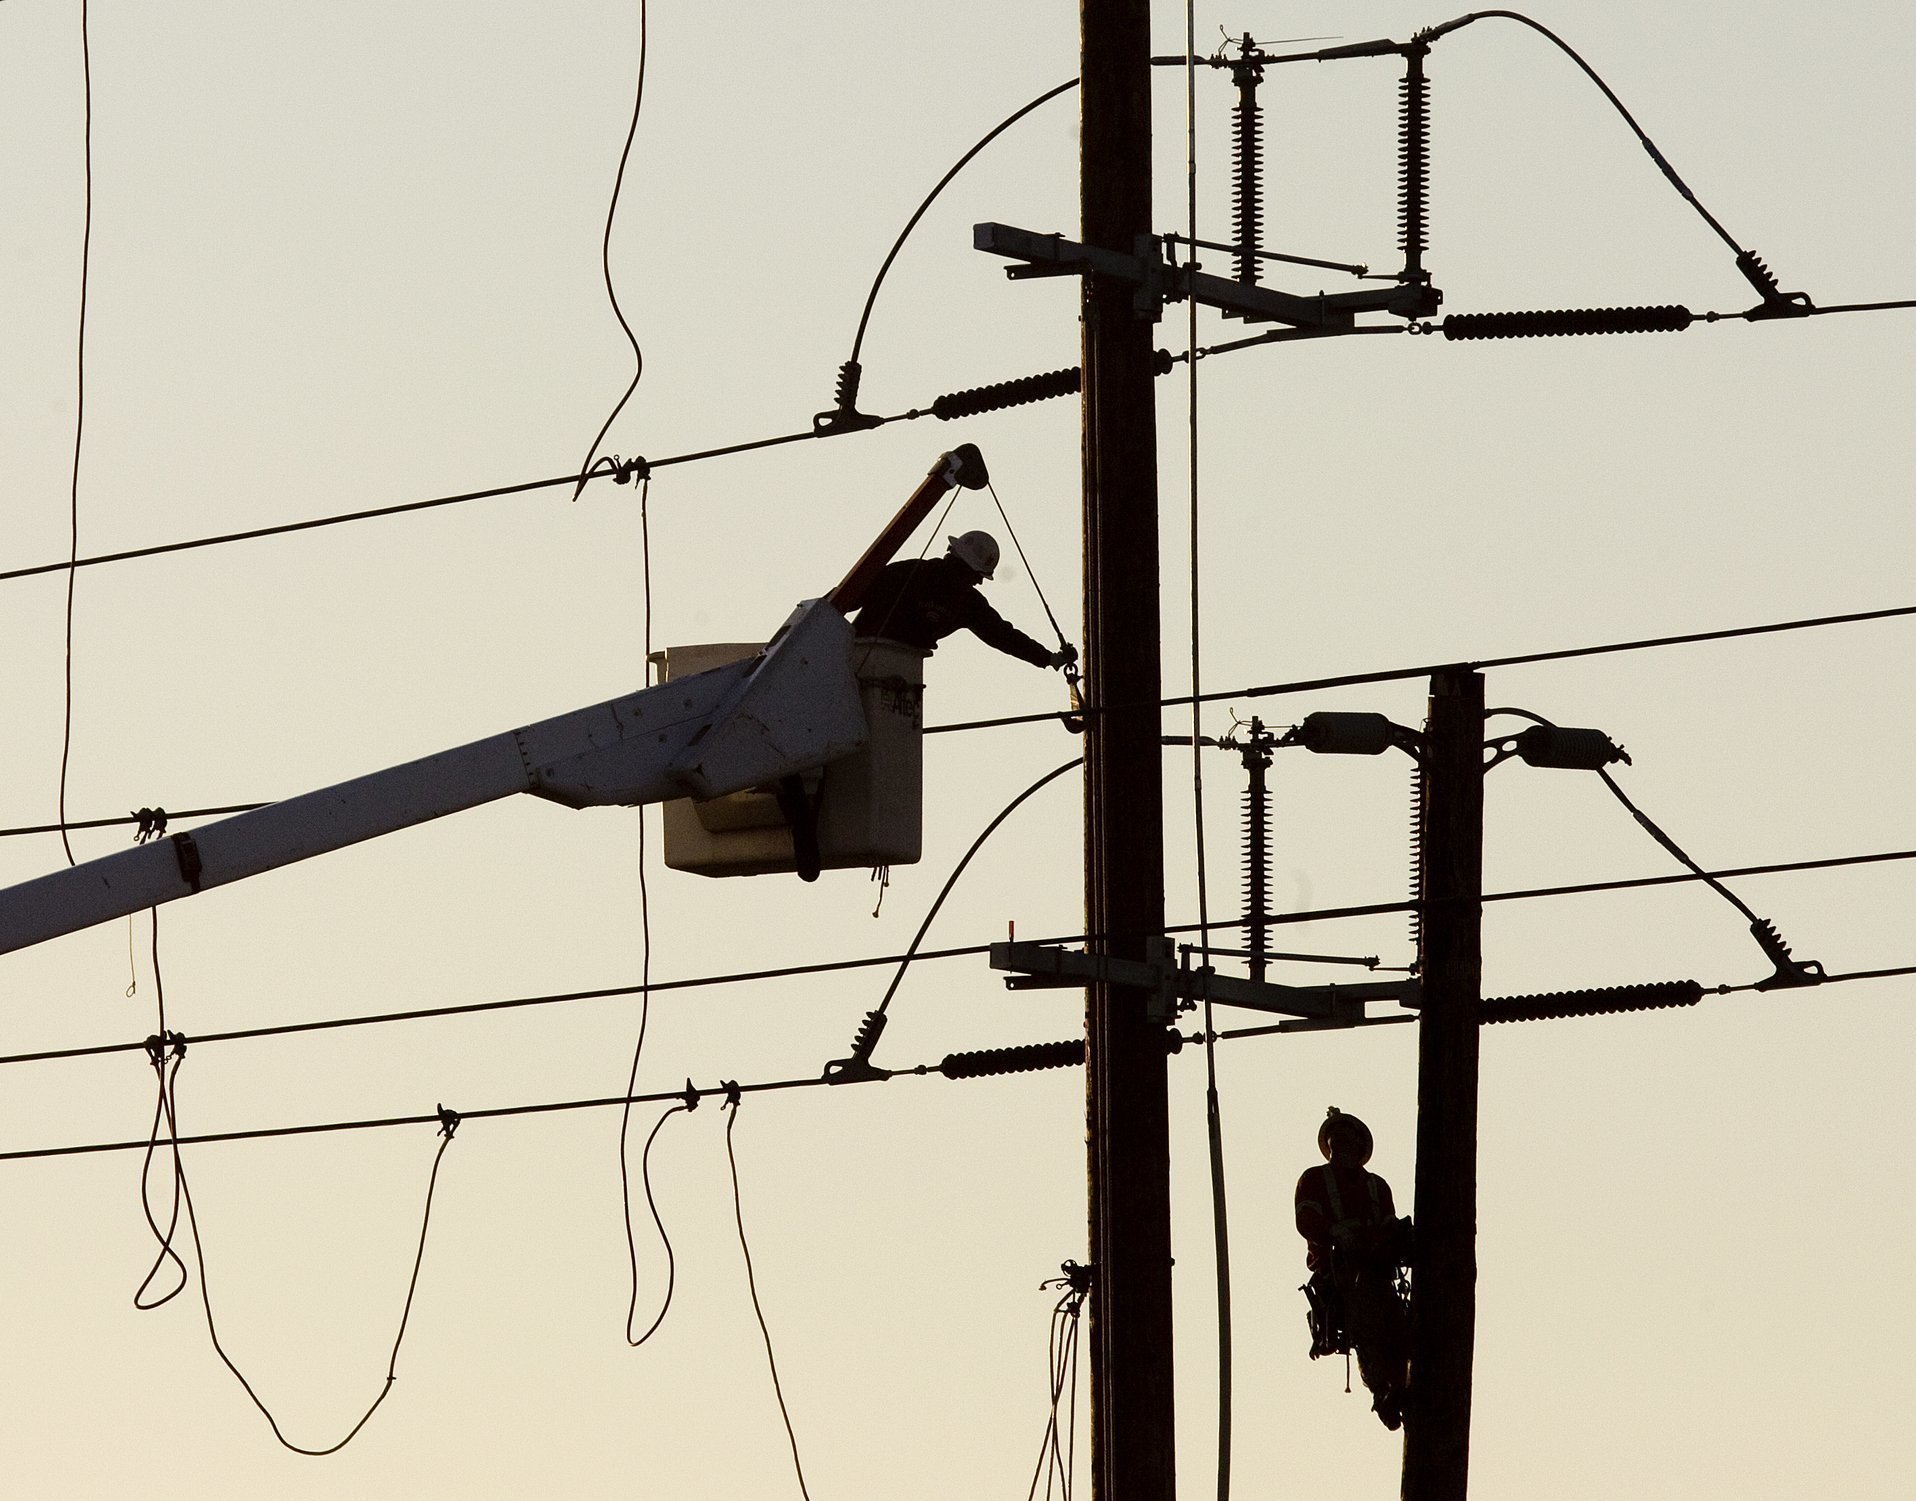 Neighborhoods balk at undergrounding wires - The San Diego Union-Tribune